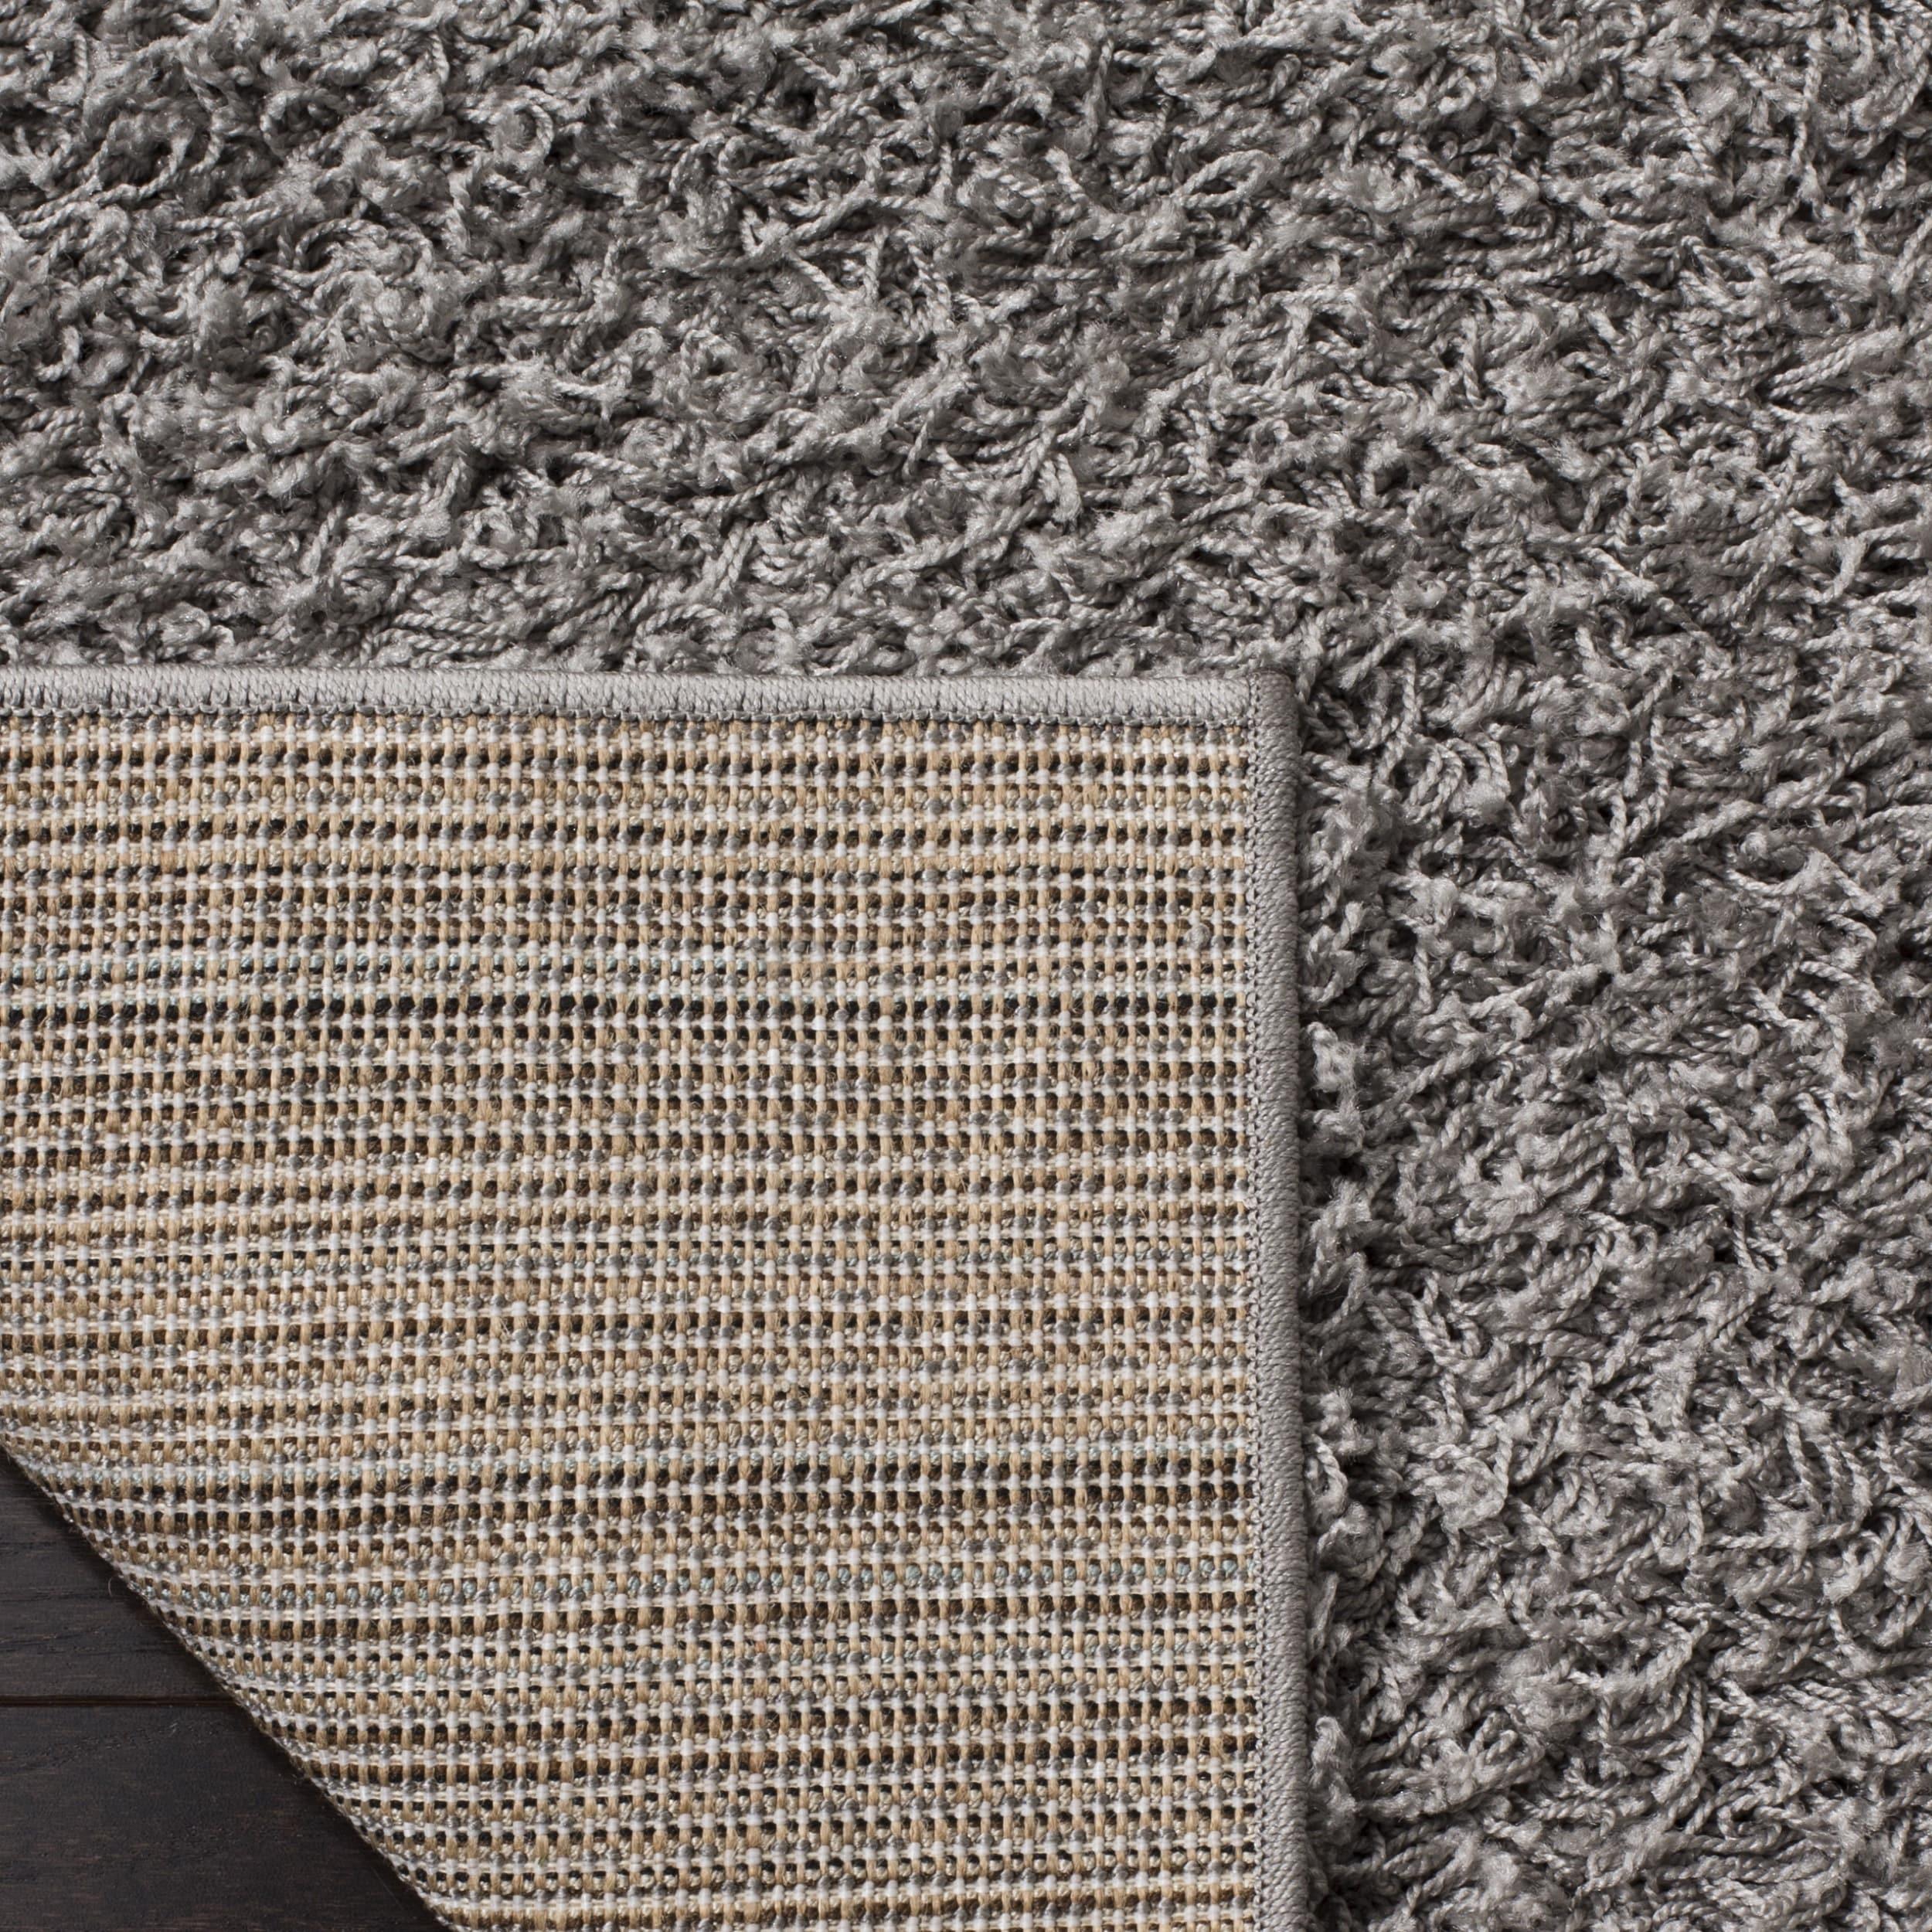 shipping free safavieh light home athens product garden area grey overstock shag rug dark today x